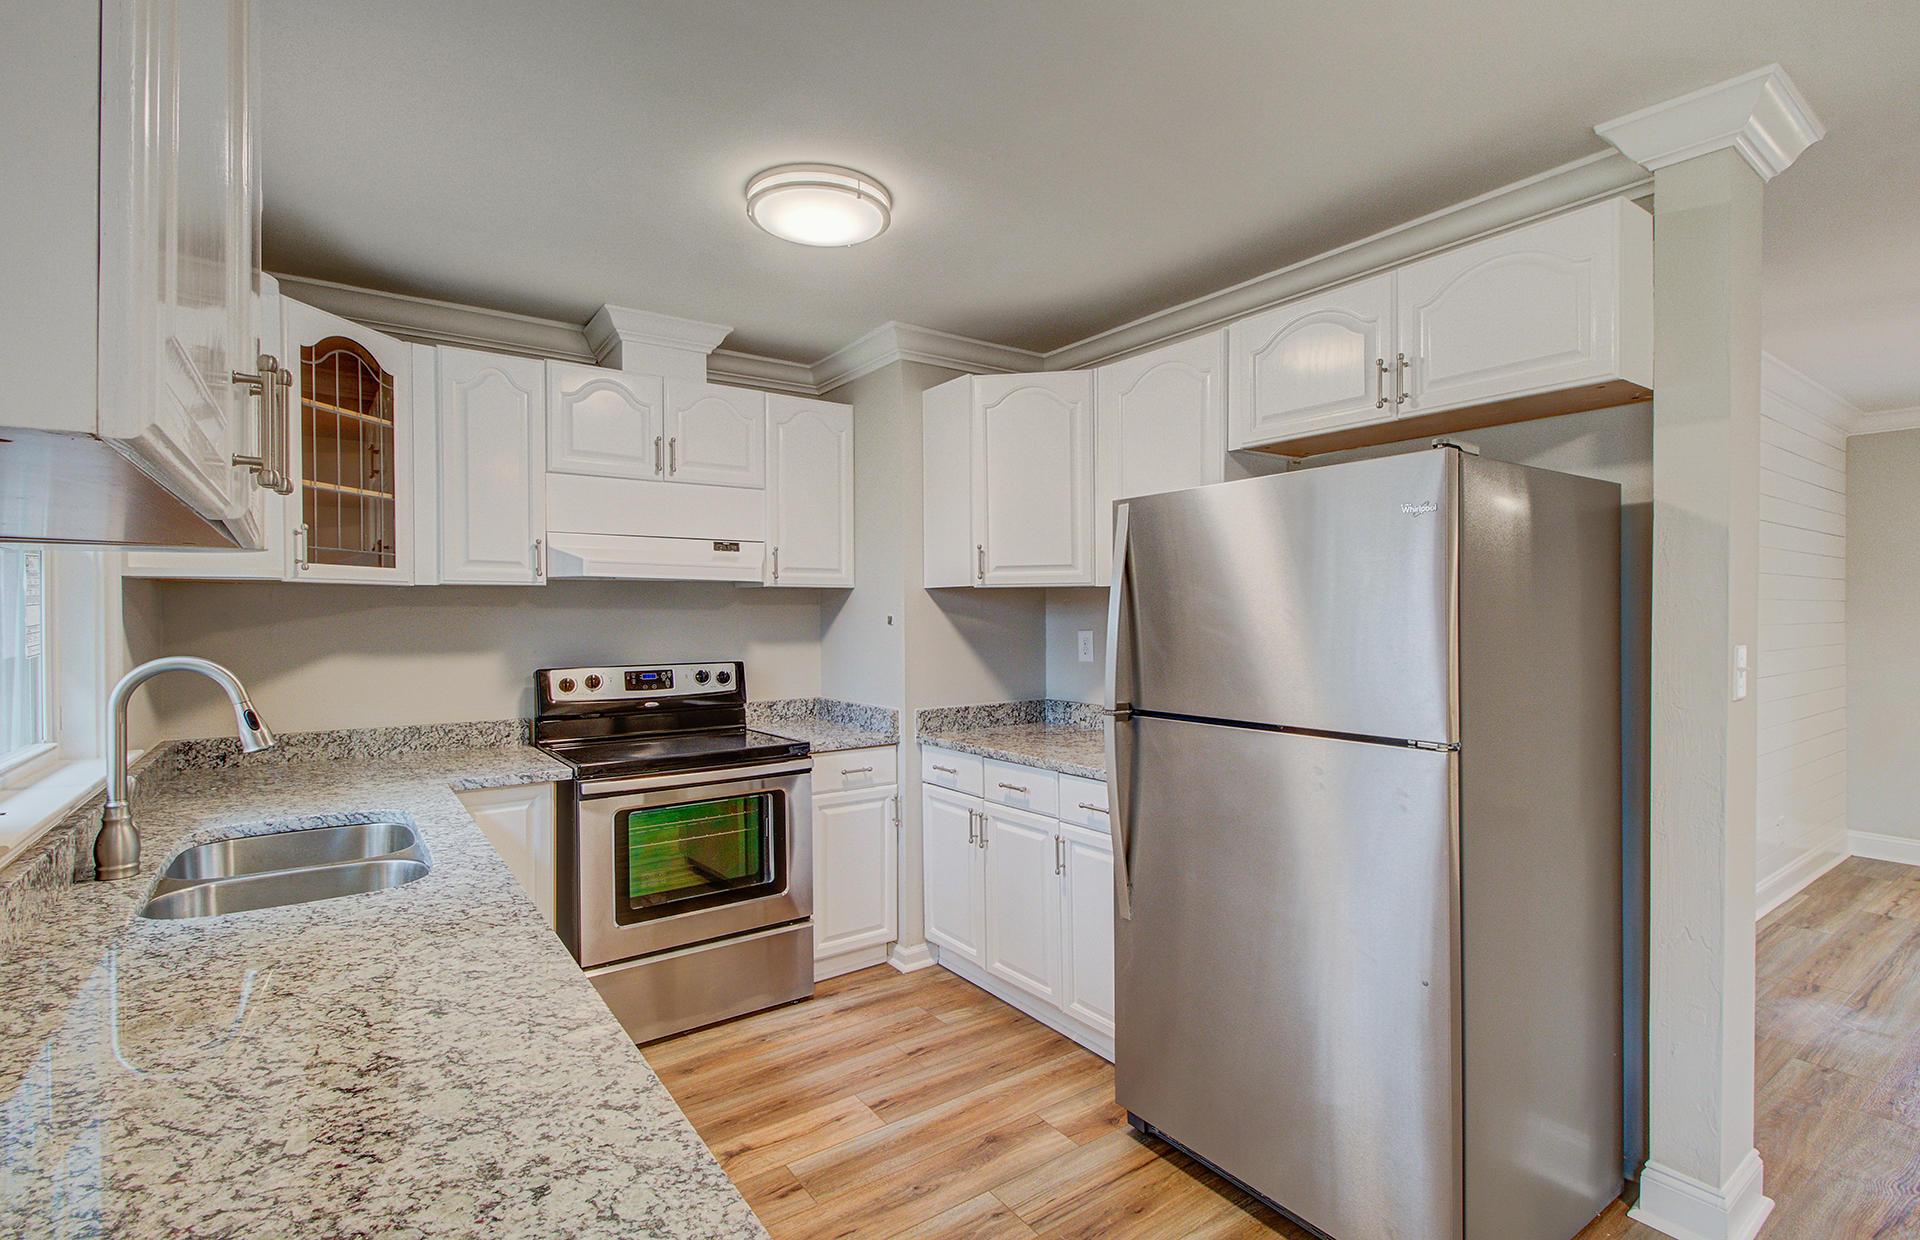 Sedgefield Section I Homes For Sale - 30 Aldene, Goose Creek, SC - 17